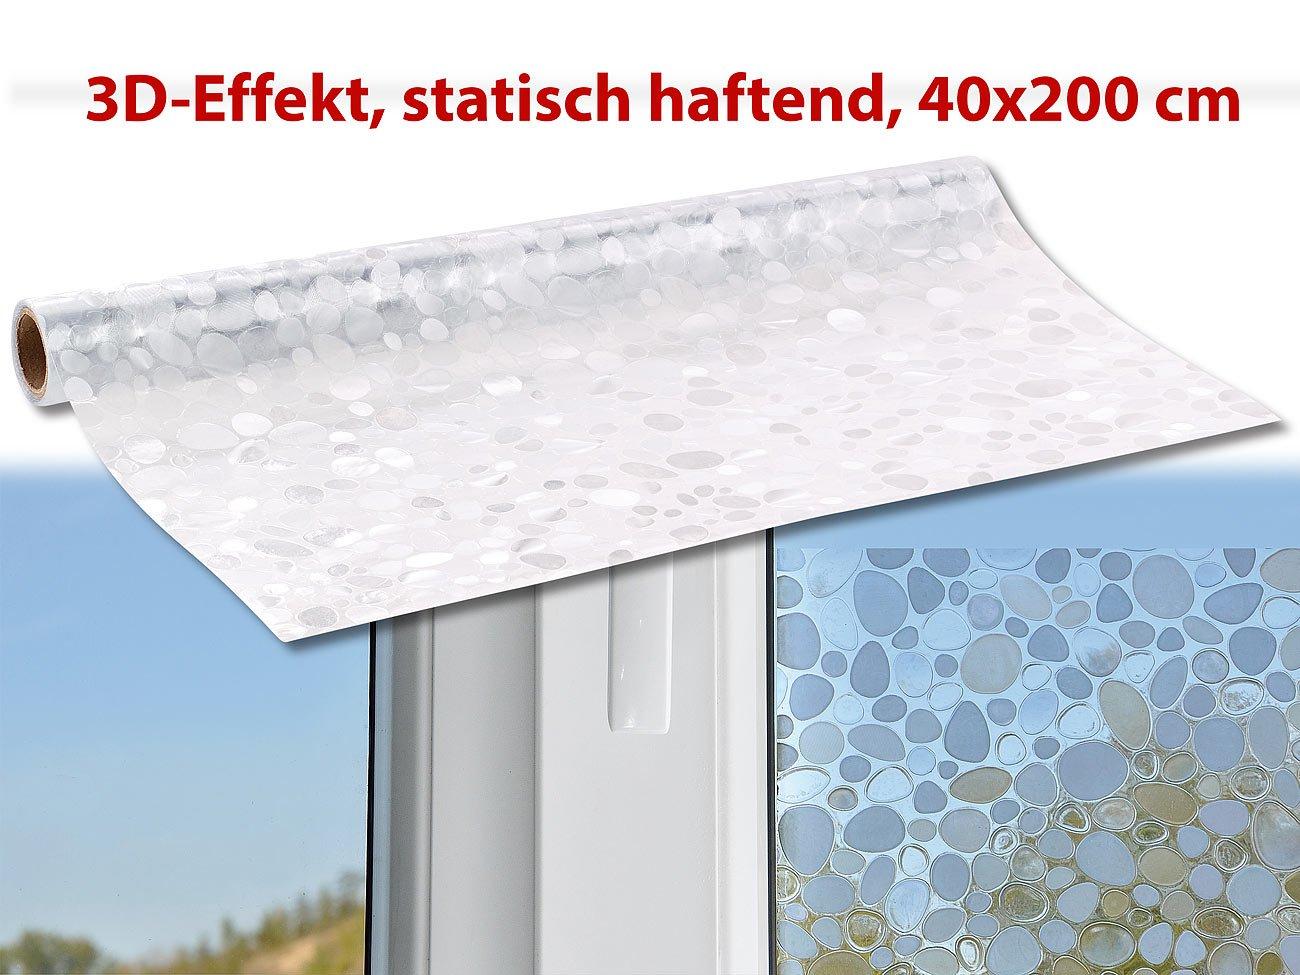 infactory Fensterfolien: 3D-Sichtschutz-Folie Kiesel, statisch ...